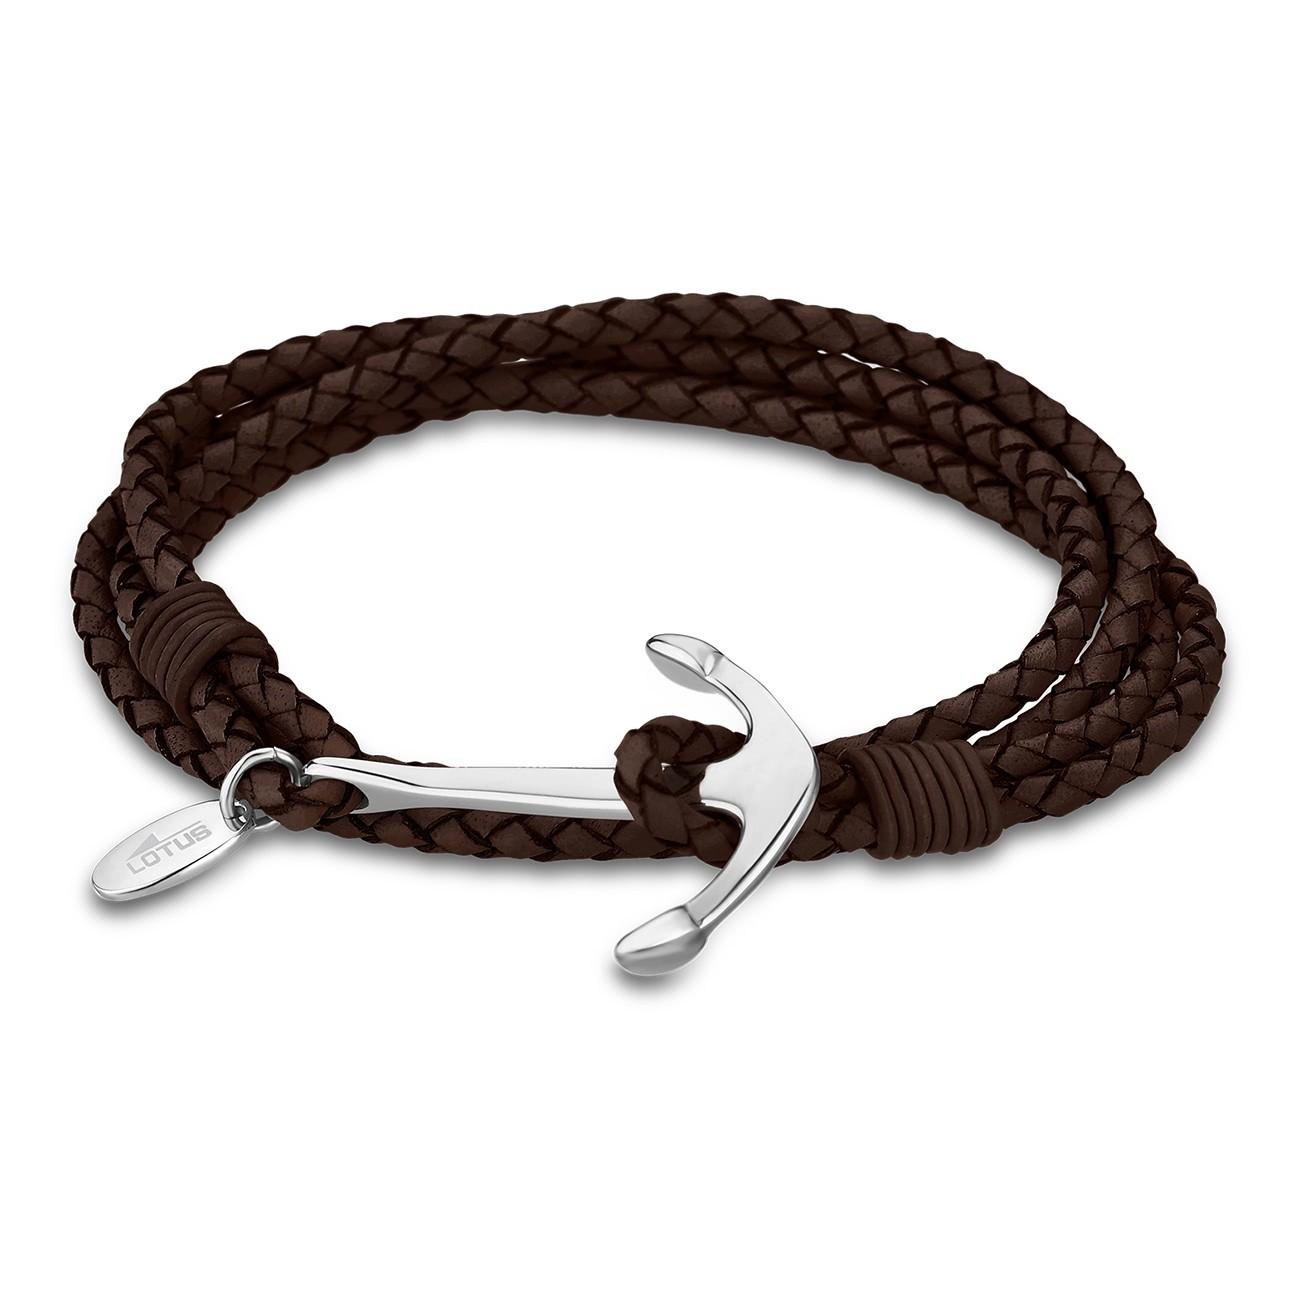 LOTUS Style Armband Anker Herren LS1831-2/3 Leder braun-silber JLS1831-2-3